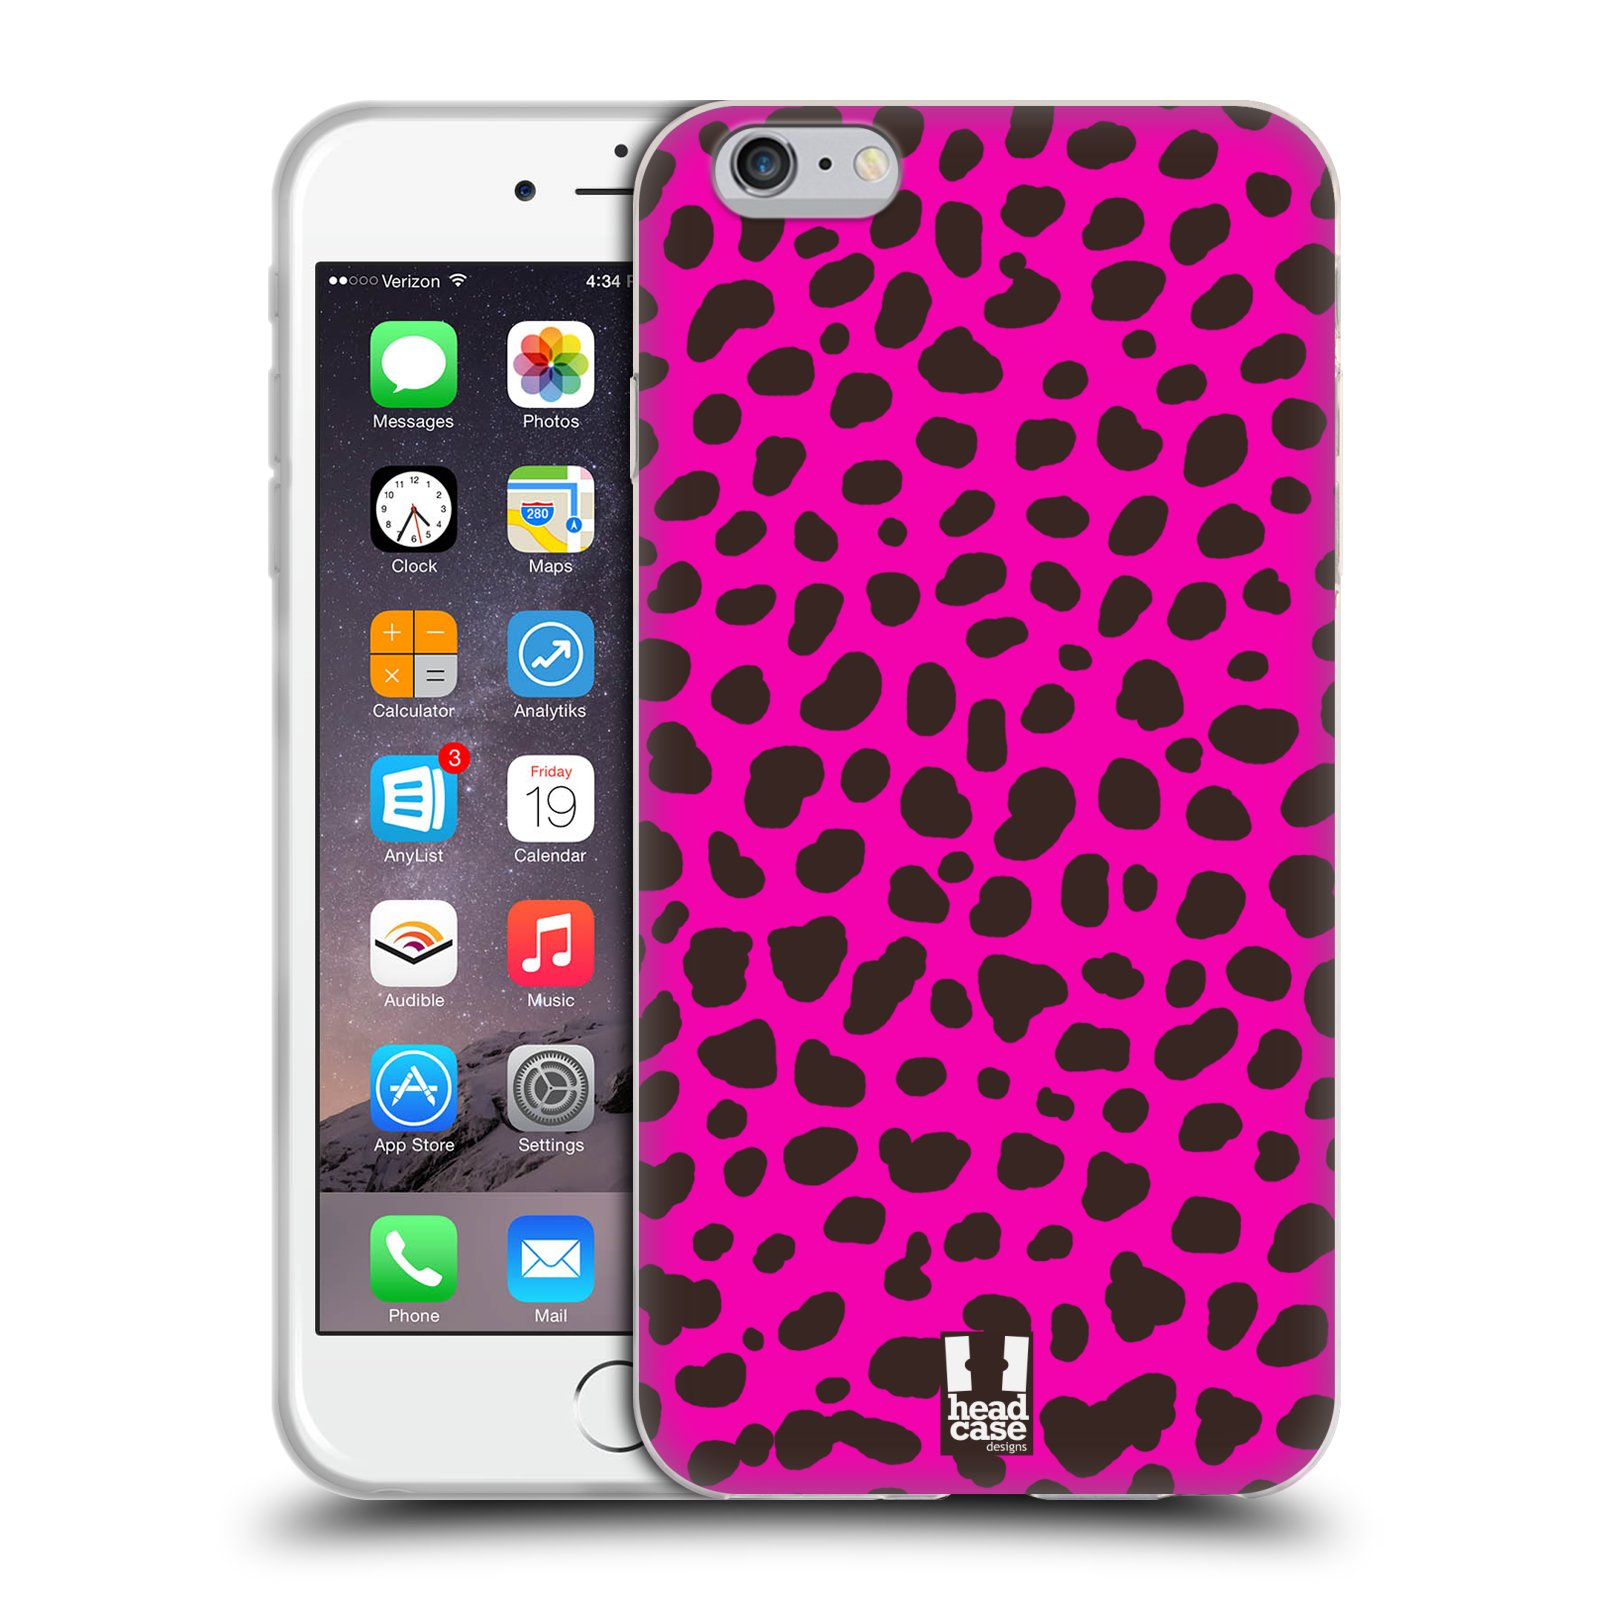 HEAD CASE silikonový obal na mobil Apple Iphone 6 PLUS/ 6S PLUS vzor Divočina zvíře 2 růžová opice